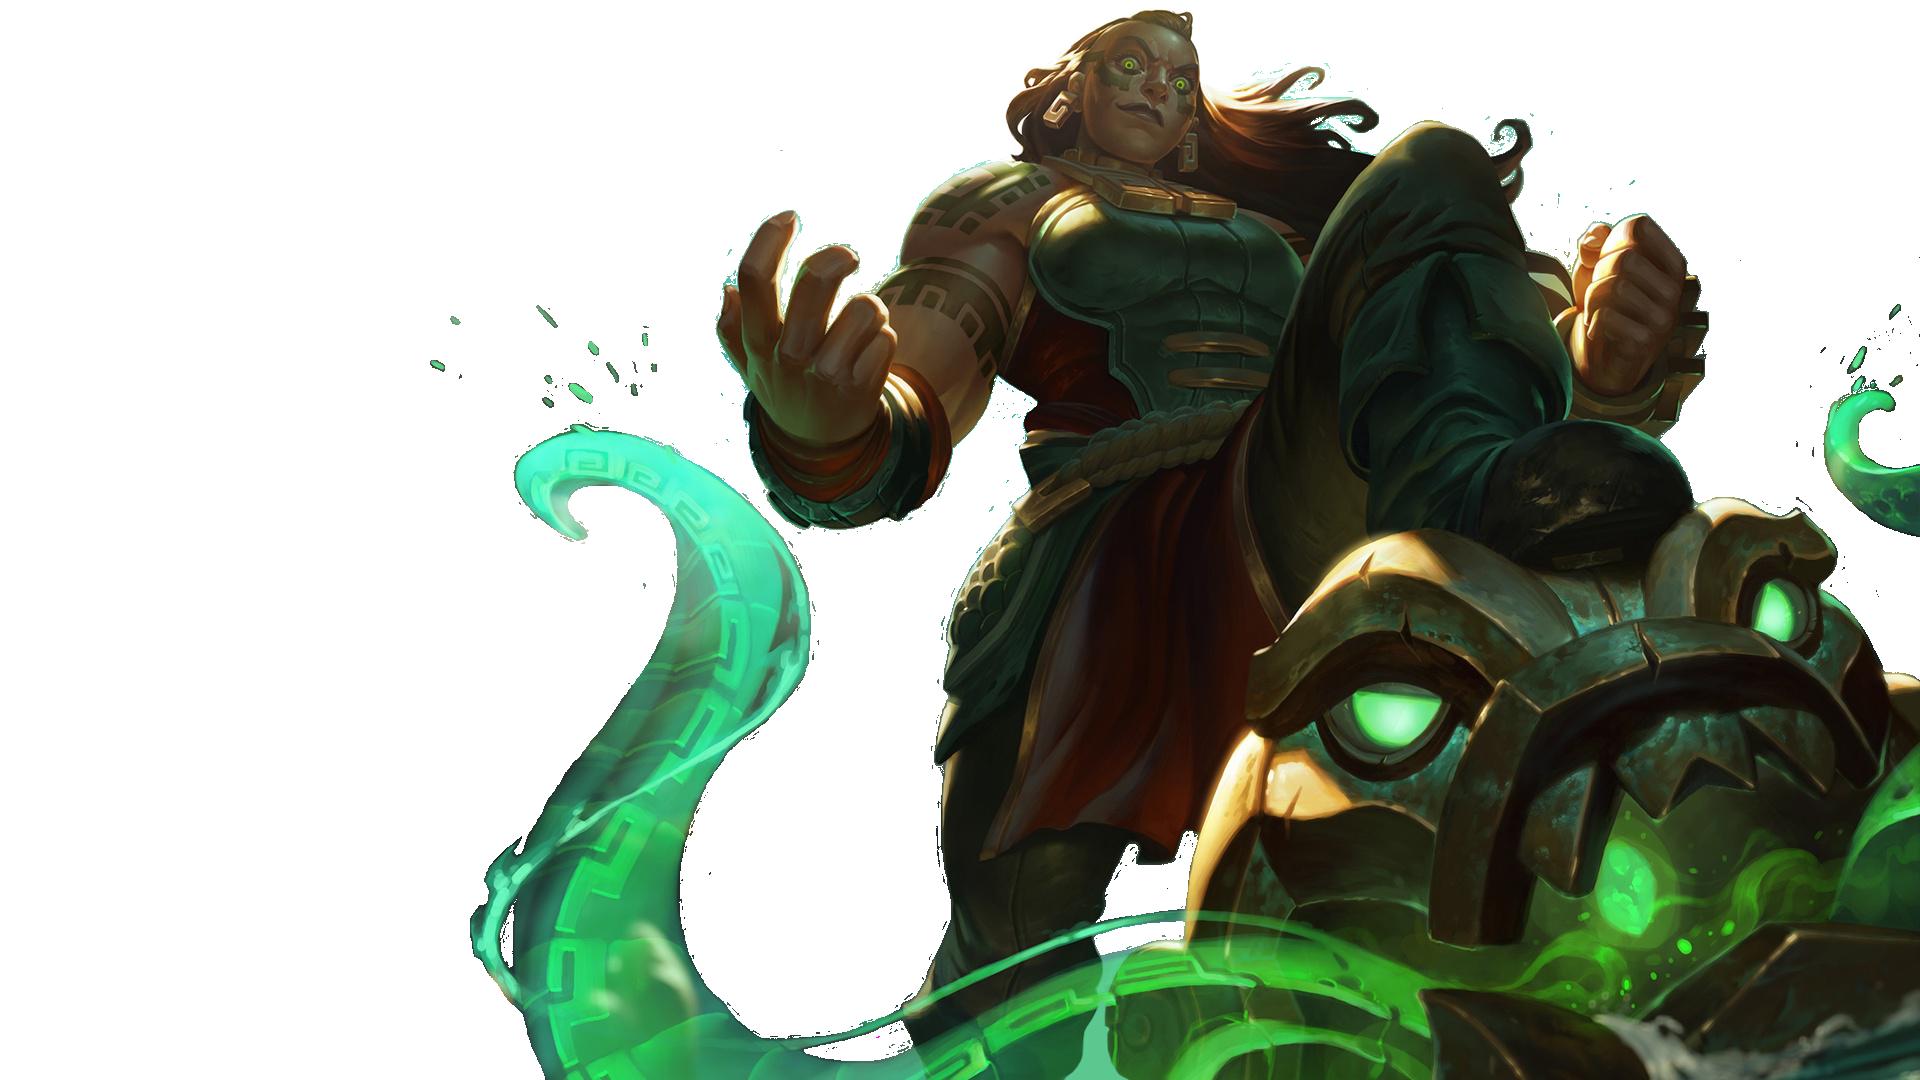 Video Game - League Of Legends Illaoi (League of Legends) Wallpaper - League Of Legends HD PNG